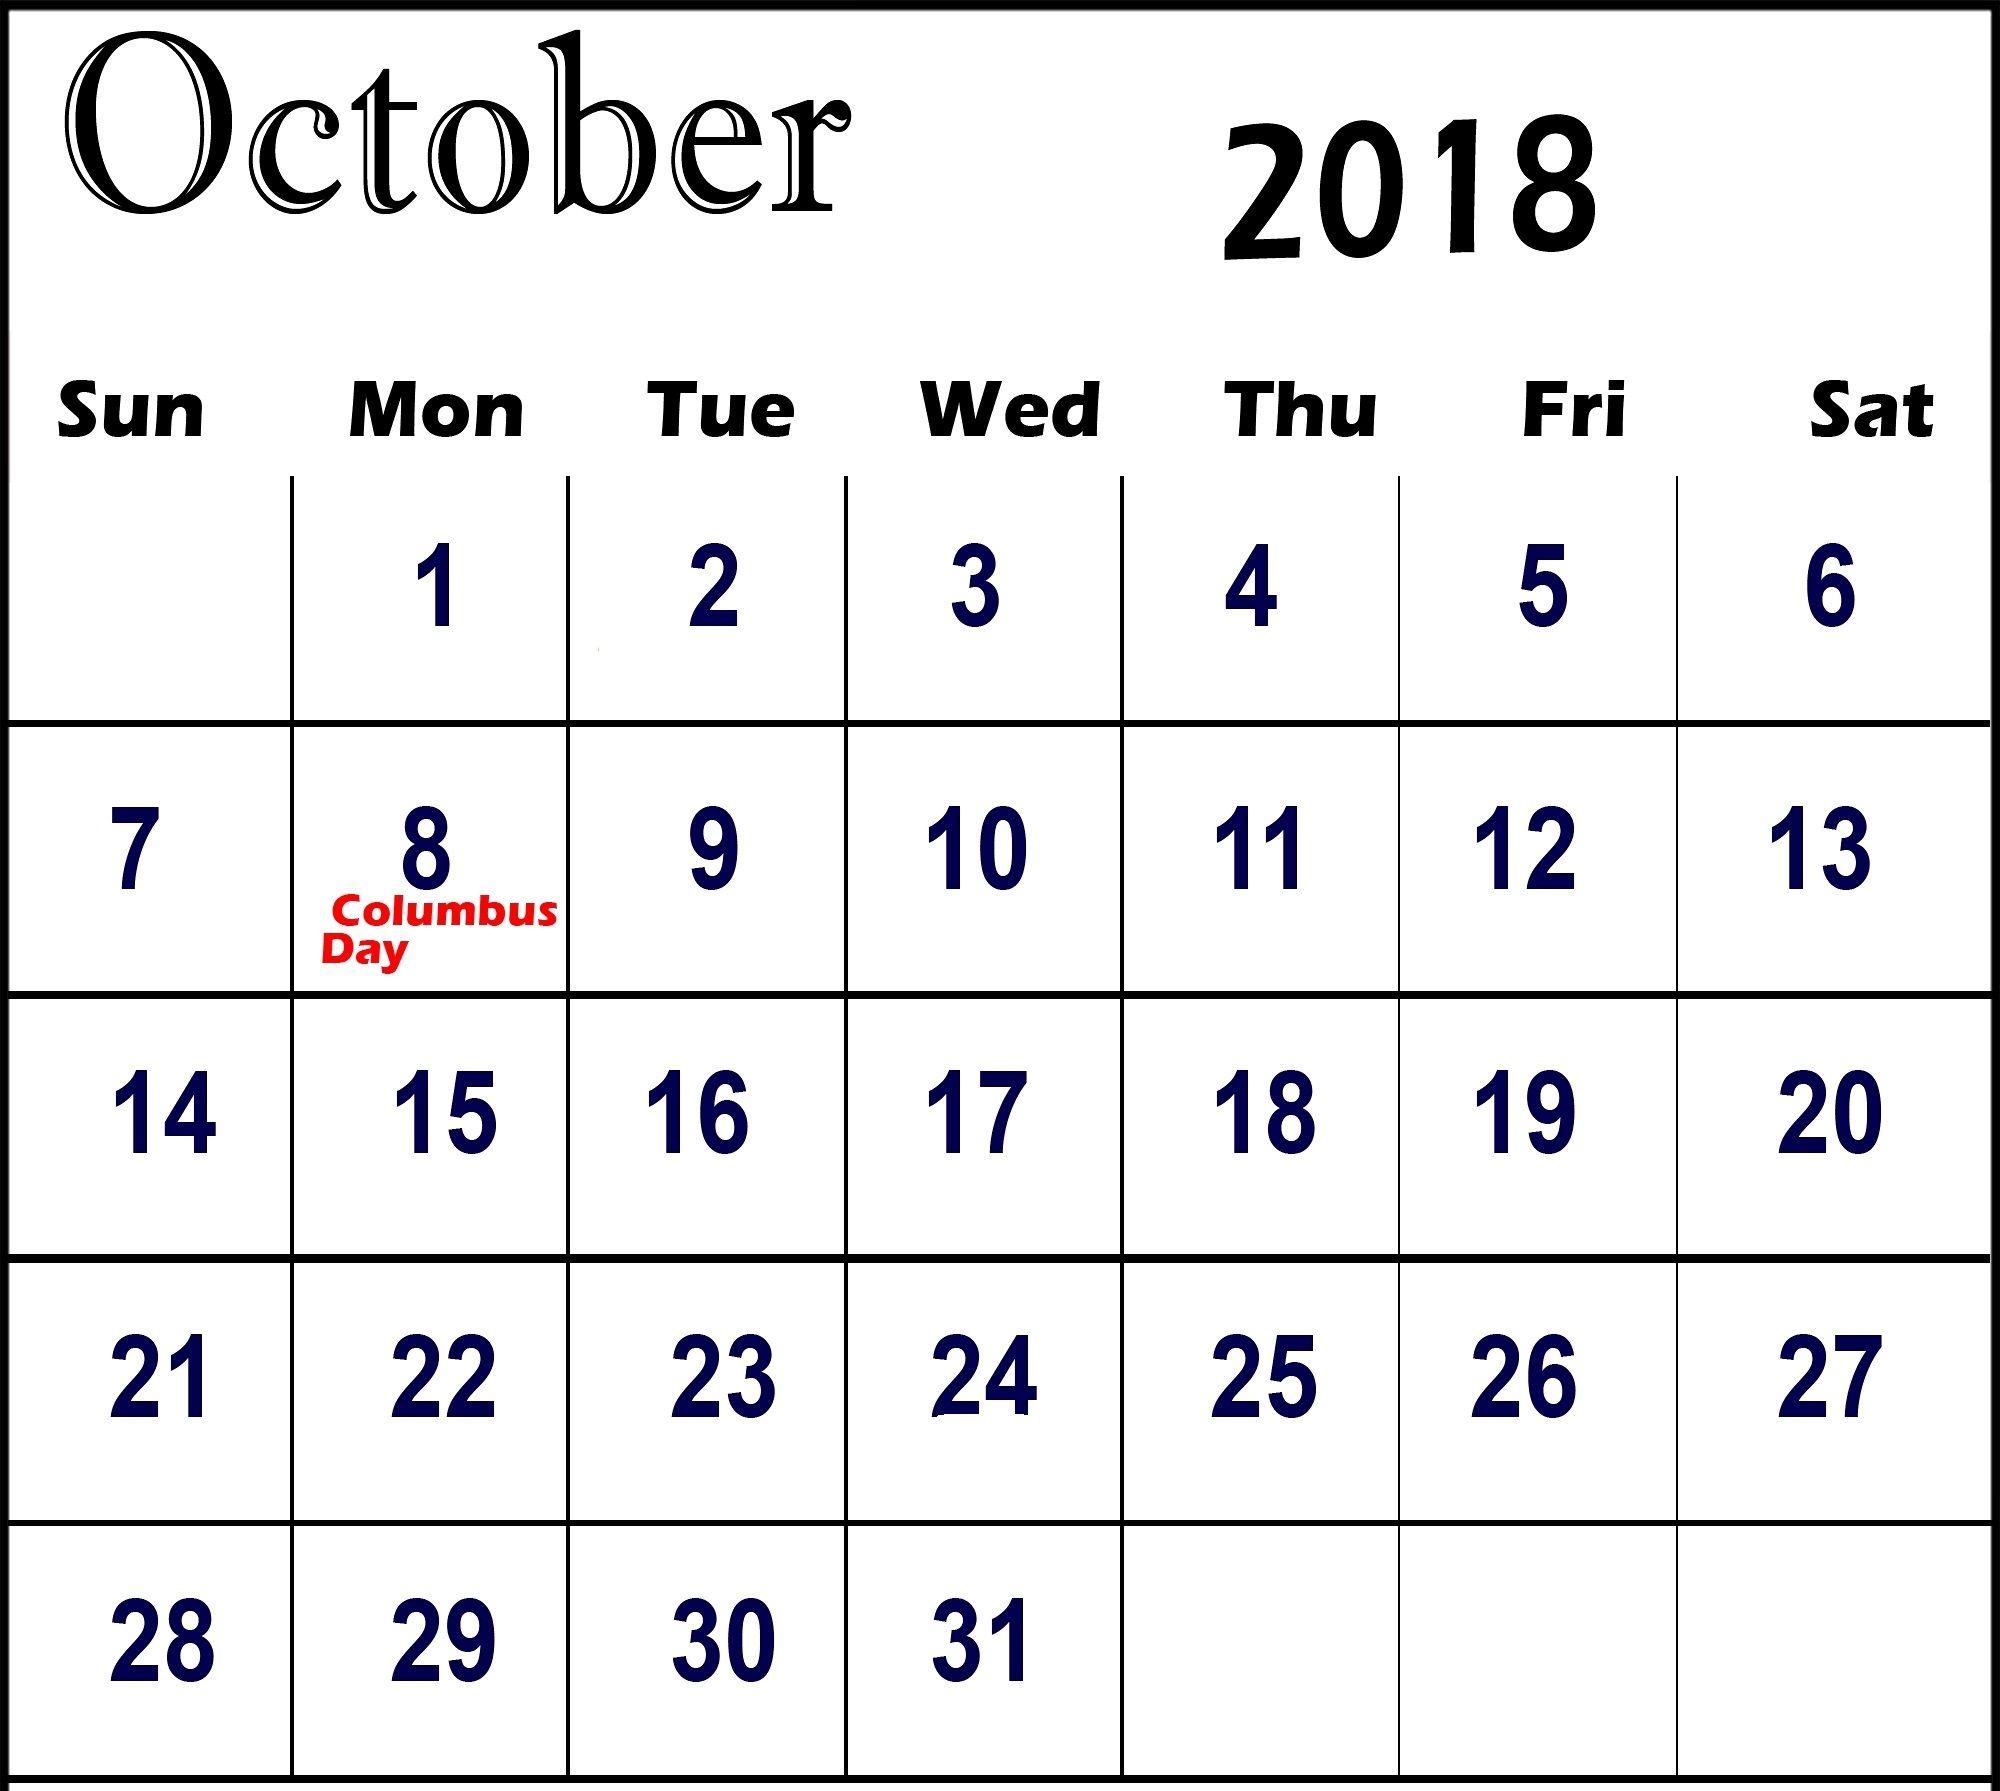 Calener October: October 2018 Calendar With USA School Holidays Printable